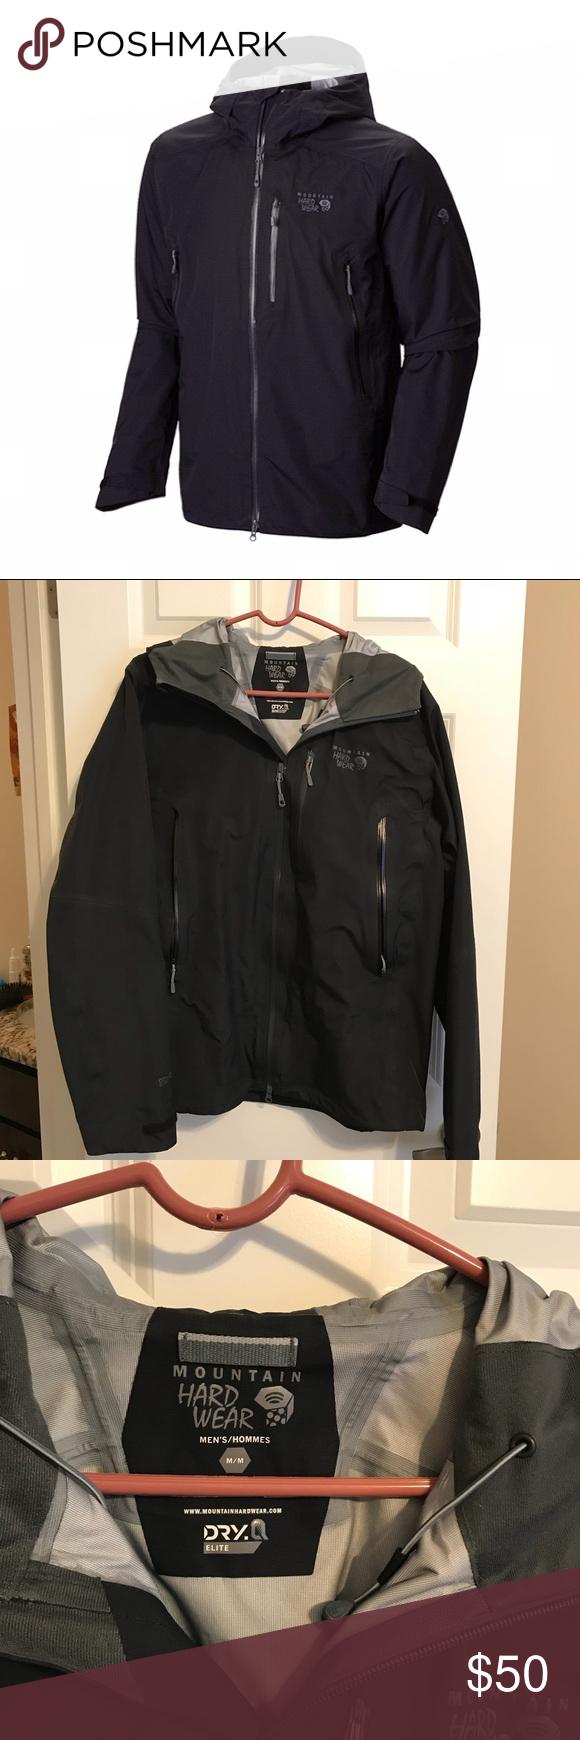 Mountain Hardwear rain jacket Jackets, Clothes design